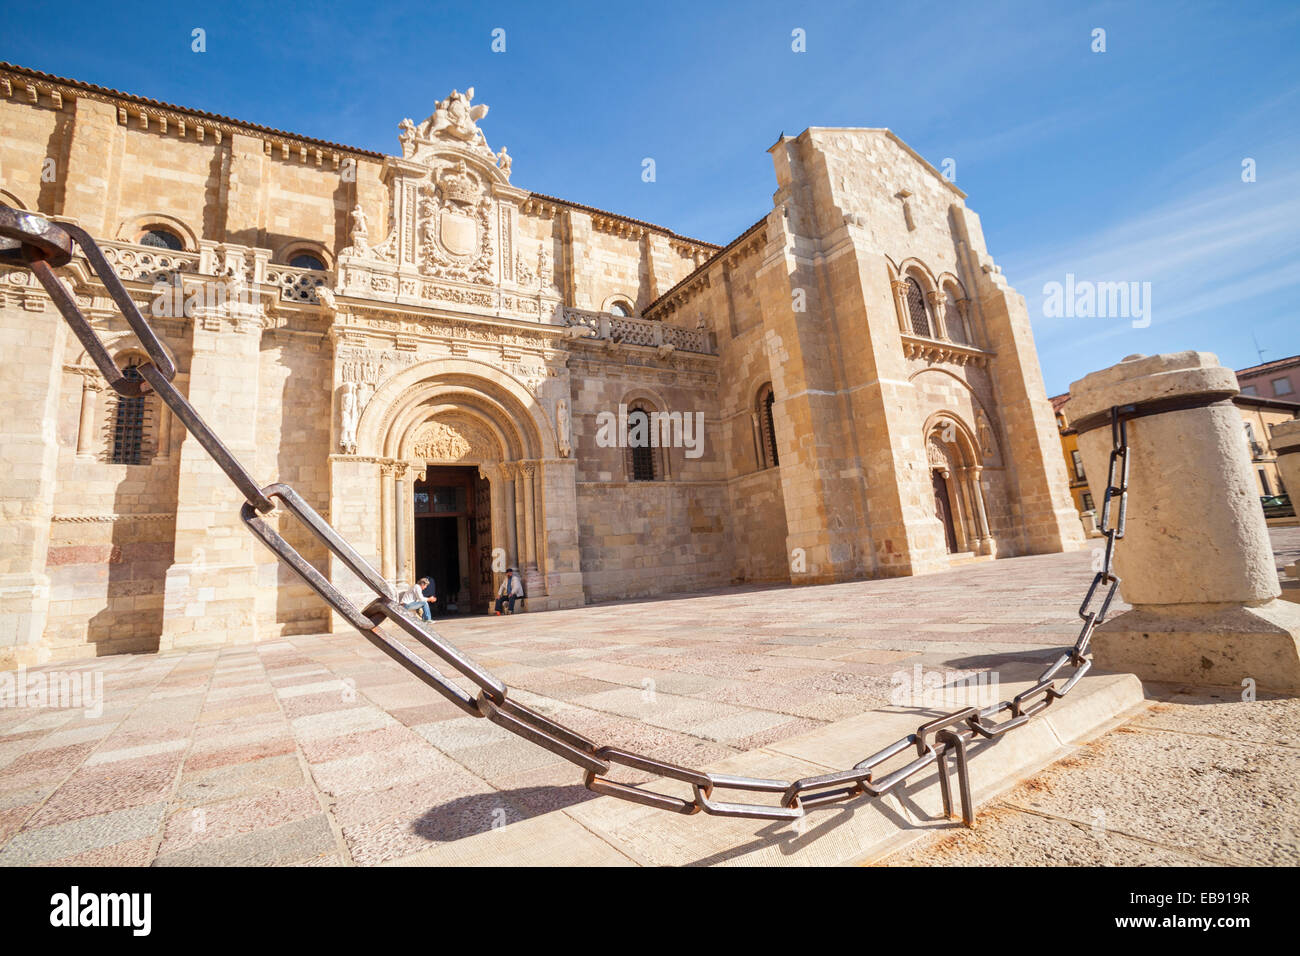 Real Colegiata de San Isidoro in Leon, Way of St. James, Leon, Spain Stock Photo